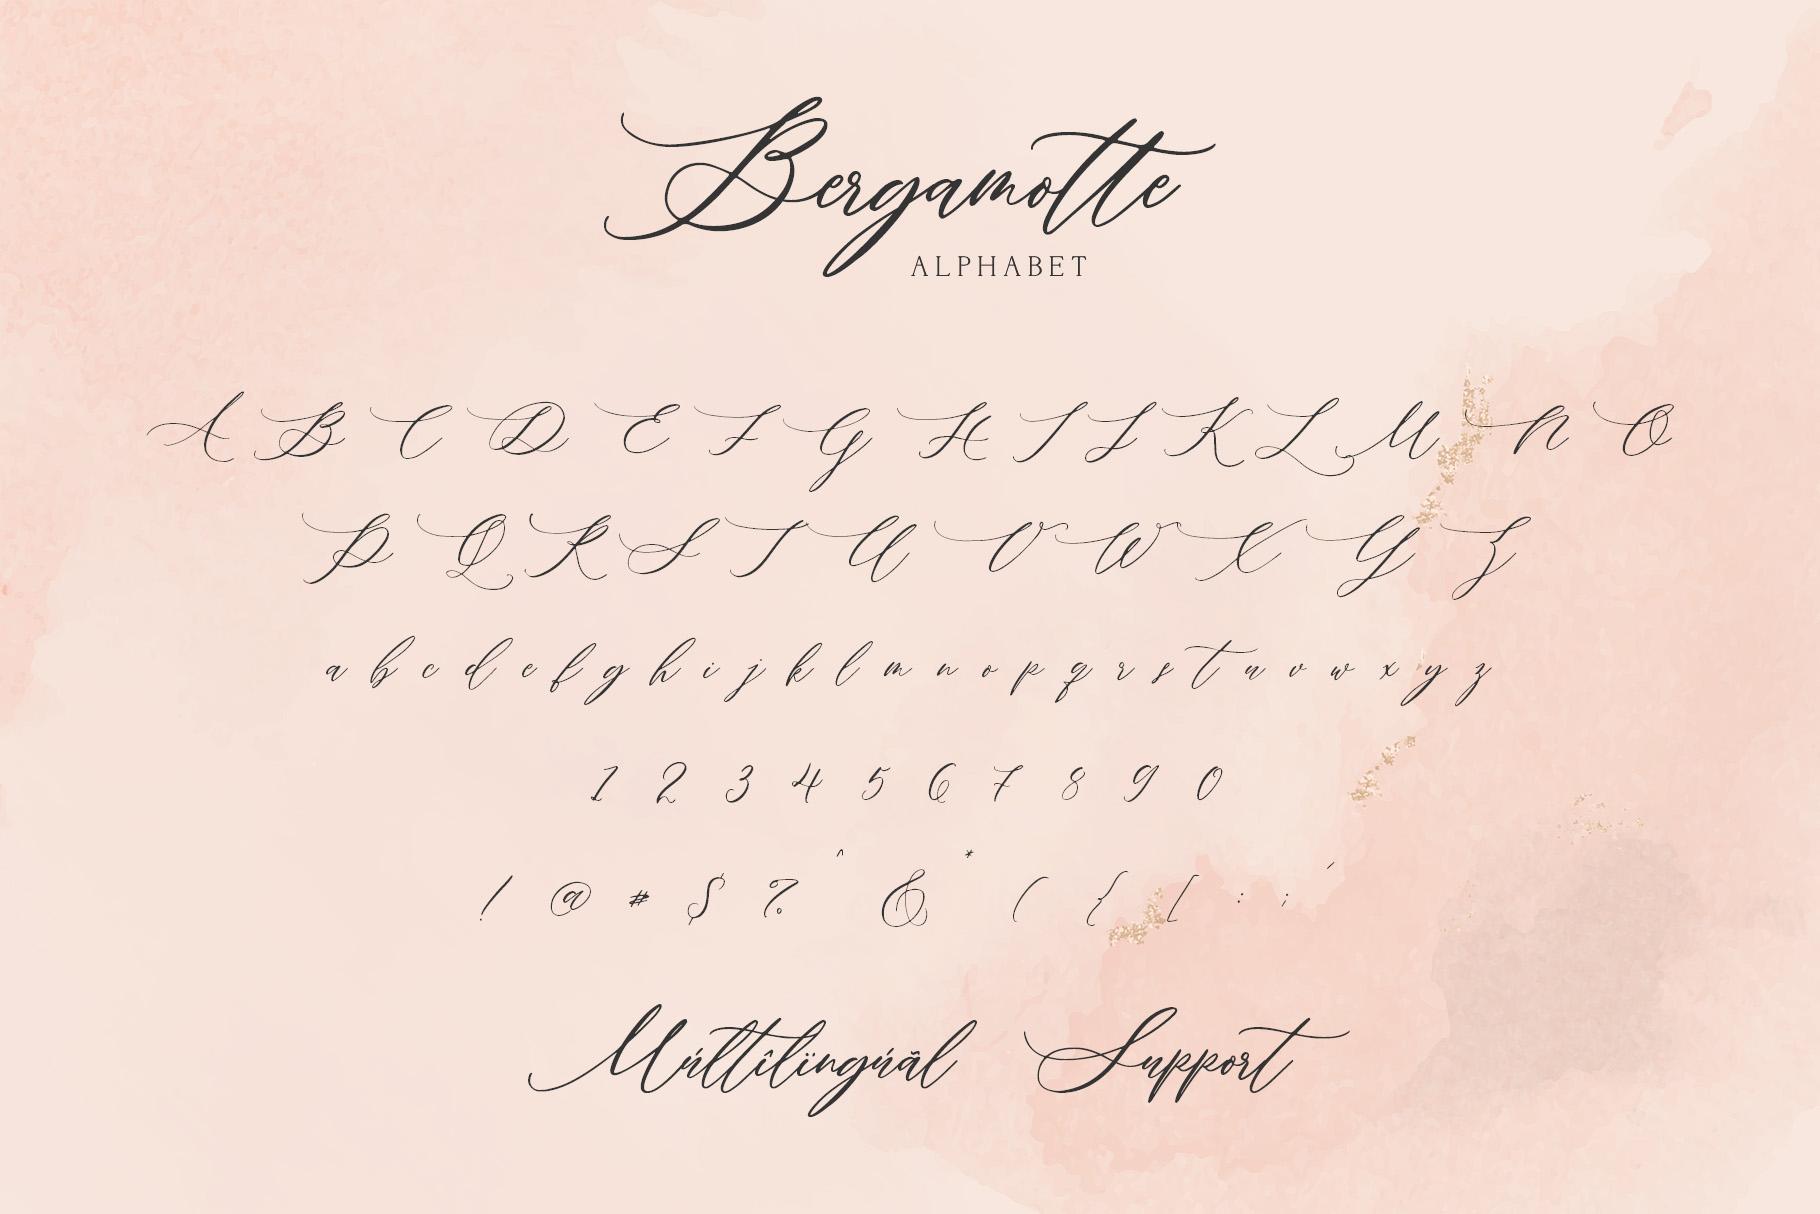 Bergamotte - Fine Art Calligraphy example image 8